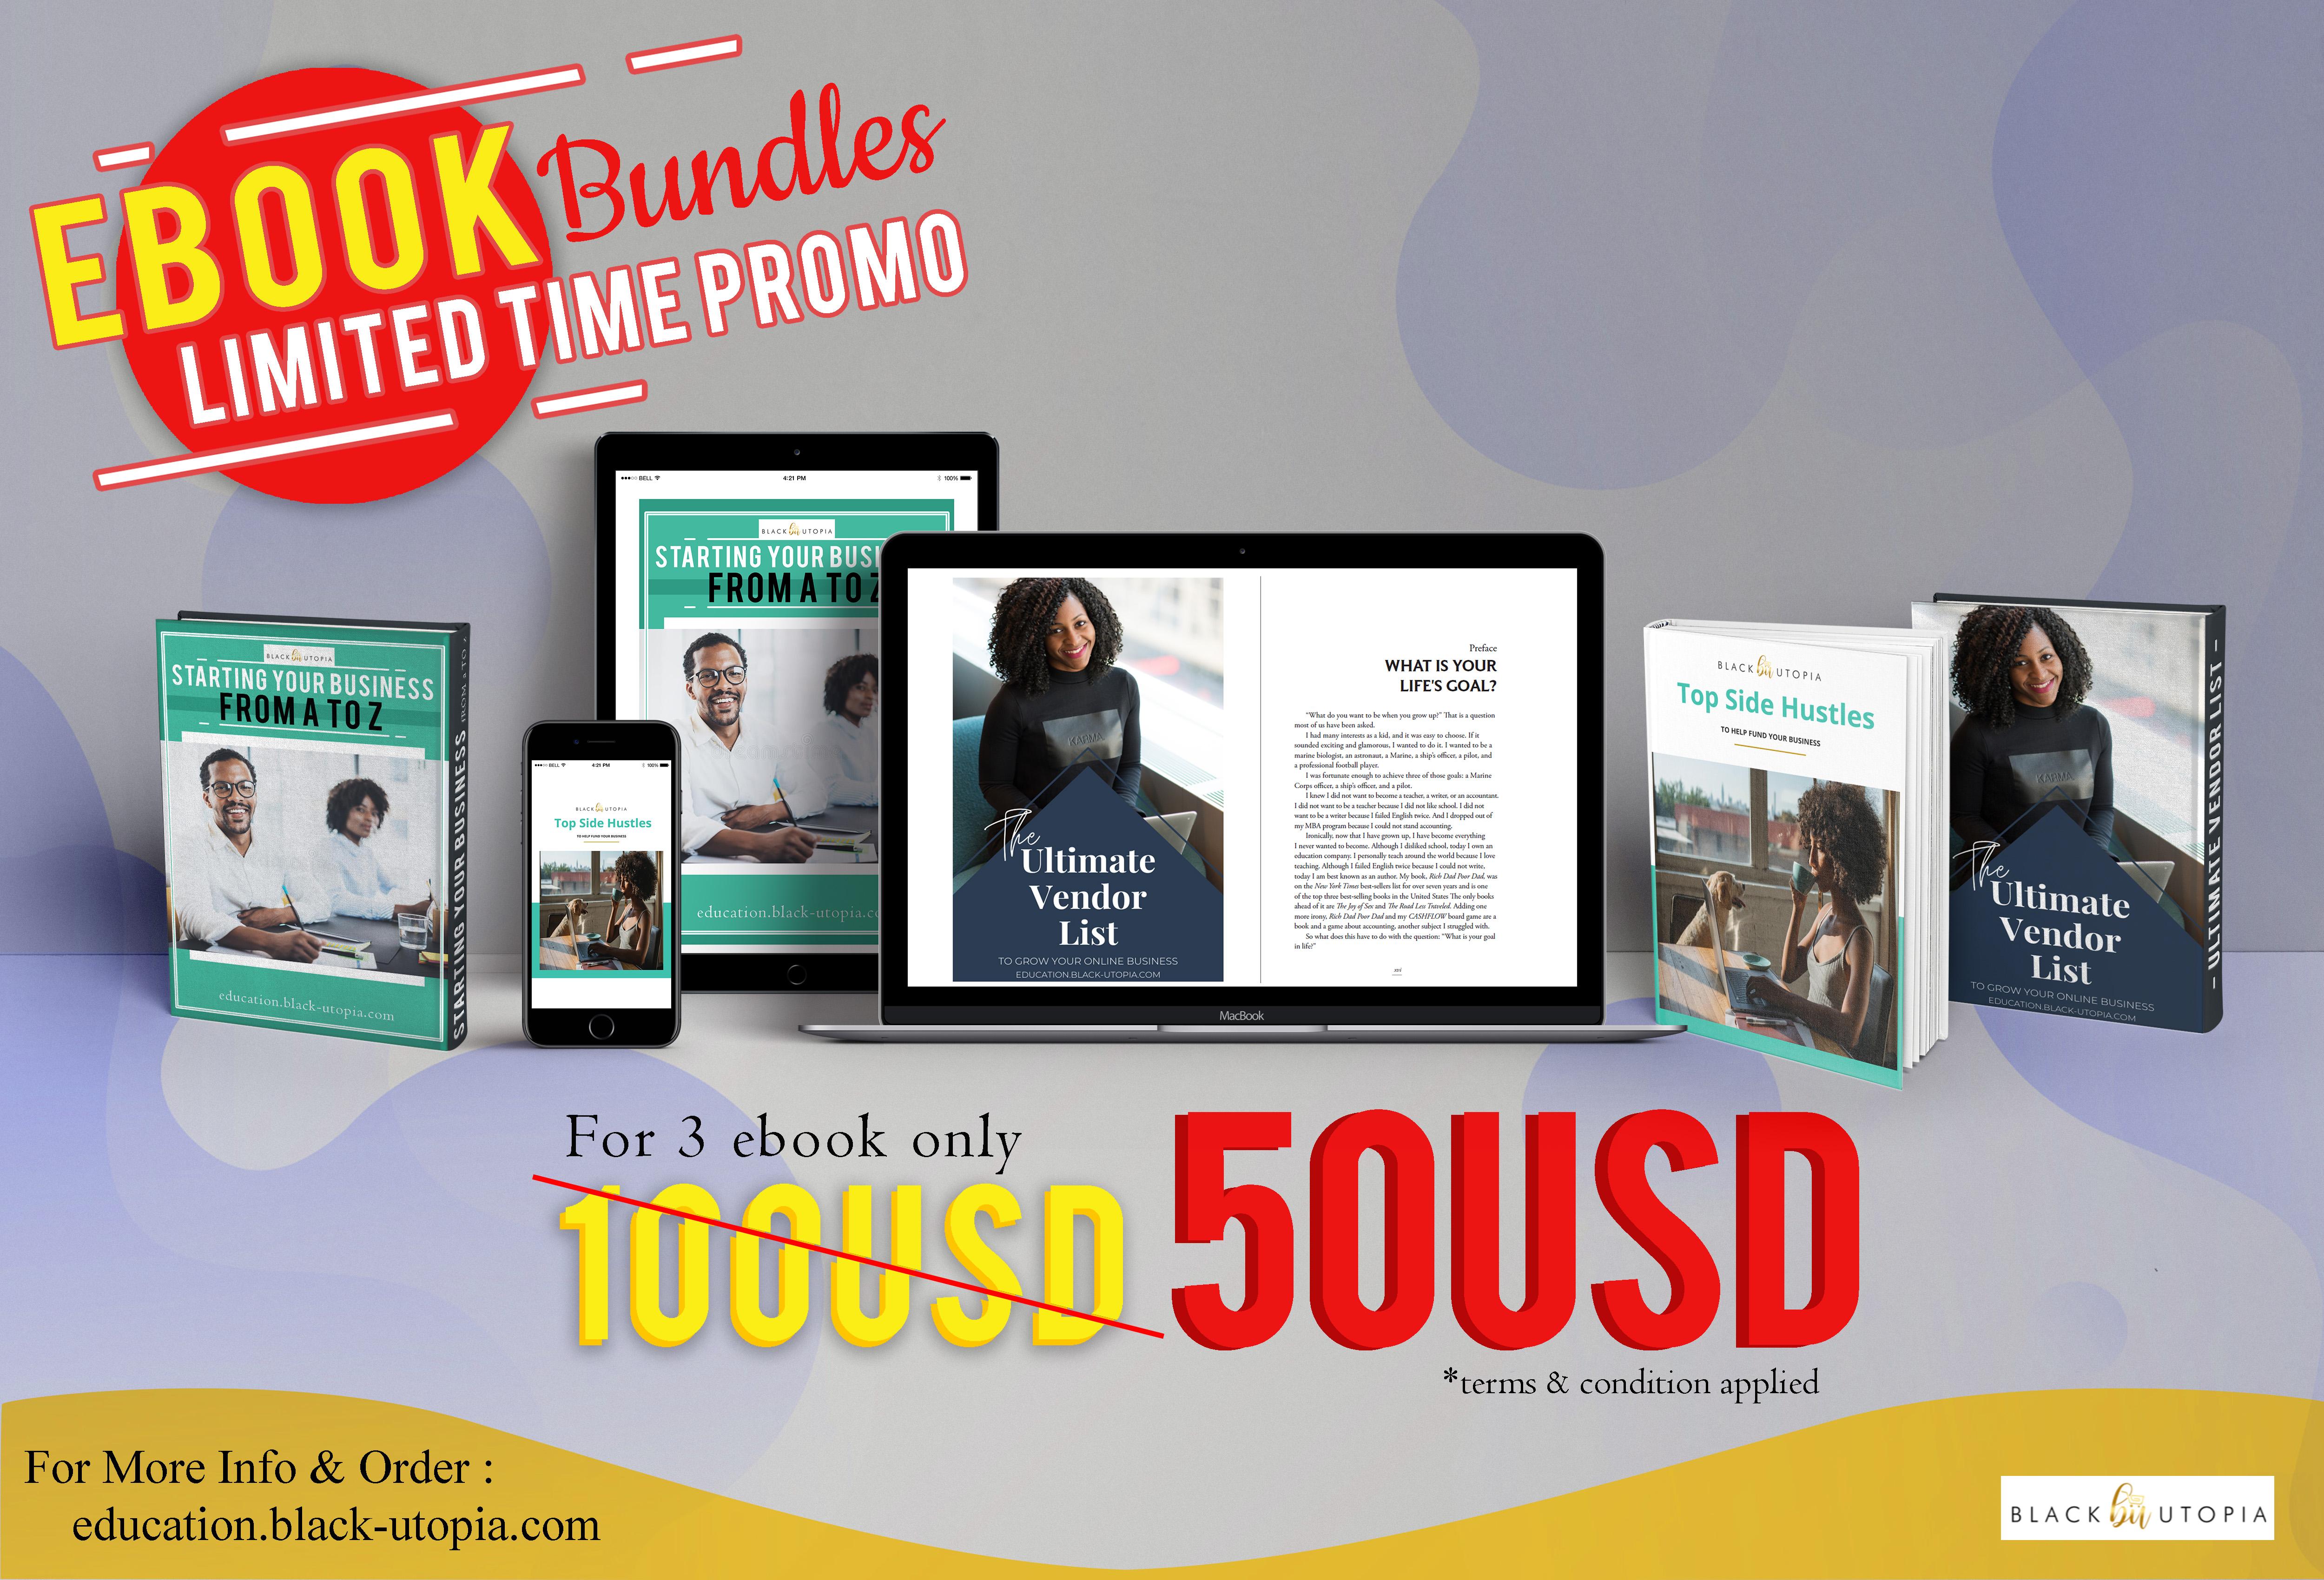 Ebook bundle 602cf9add5